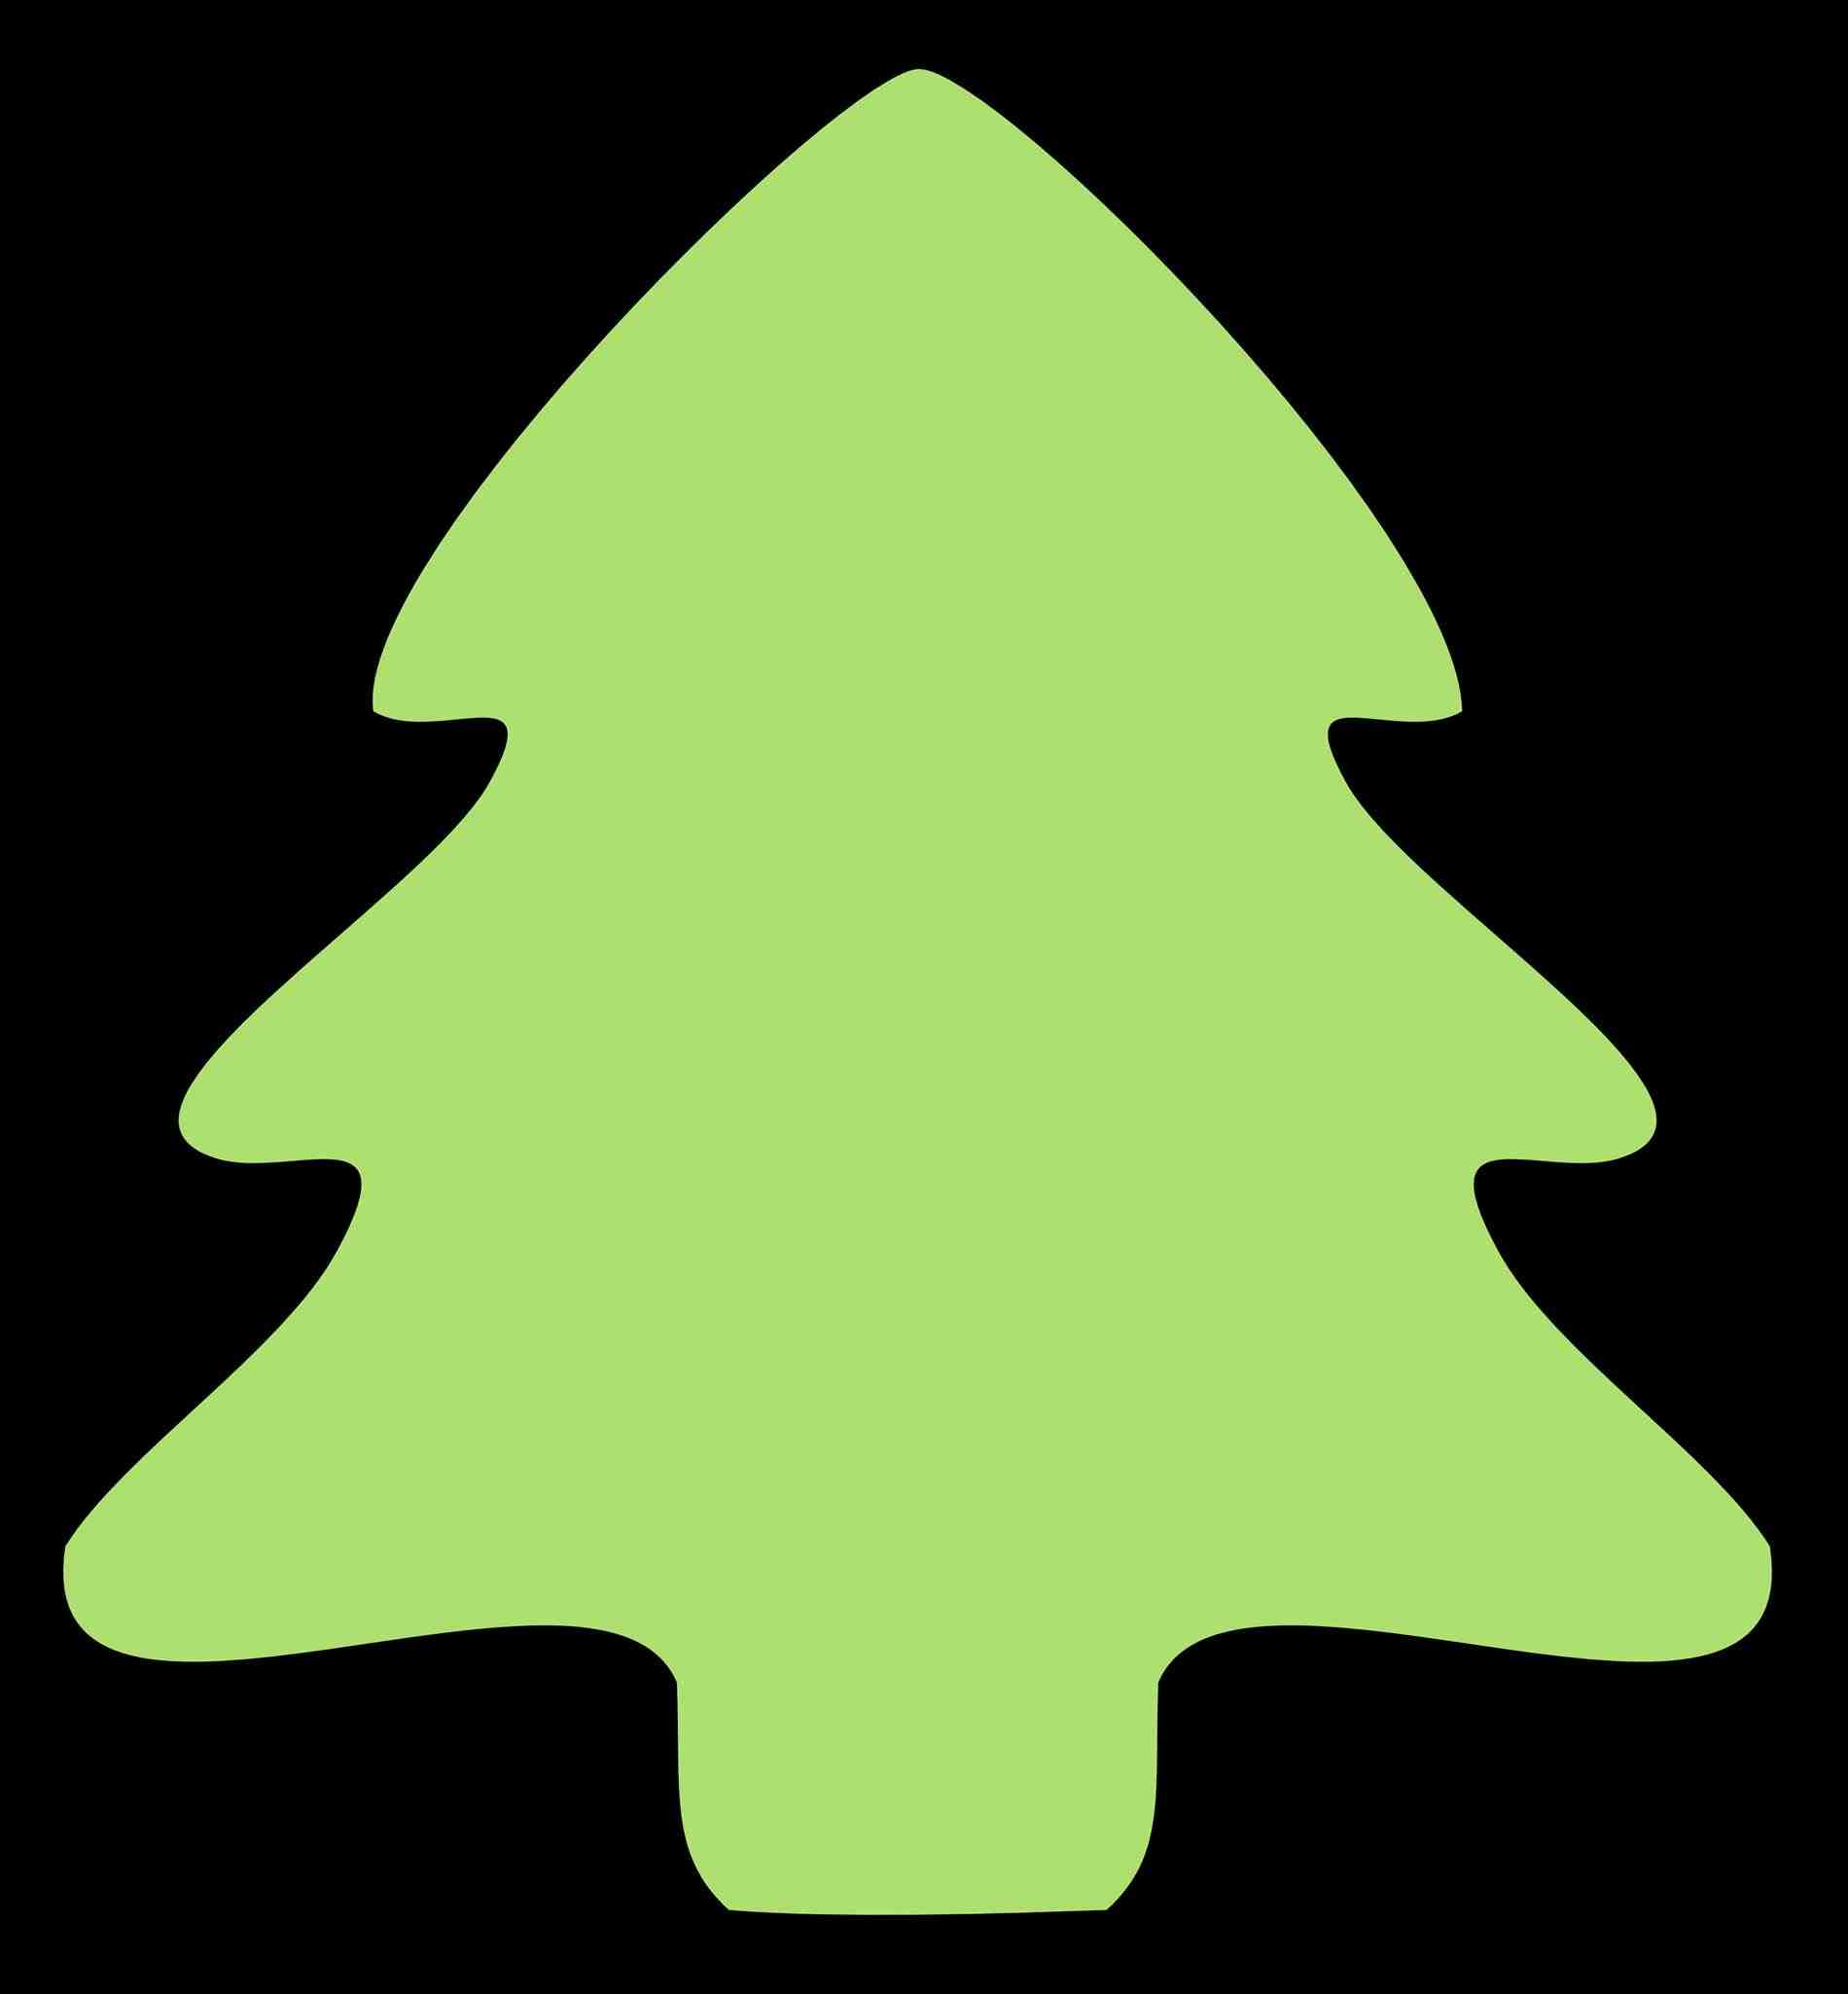 1900x2050 Green Christmas Tree Clipart Cheminee.website